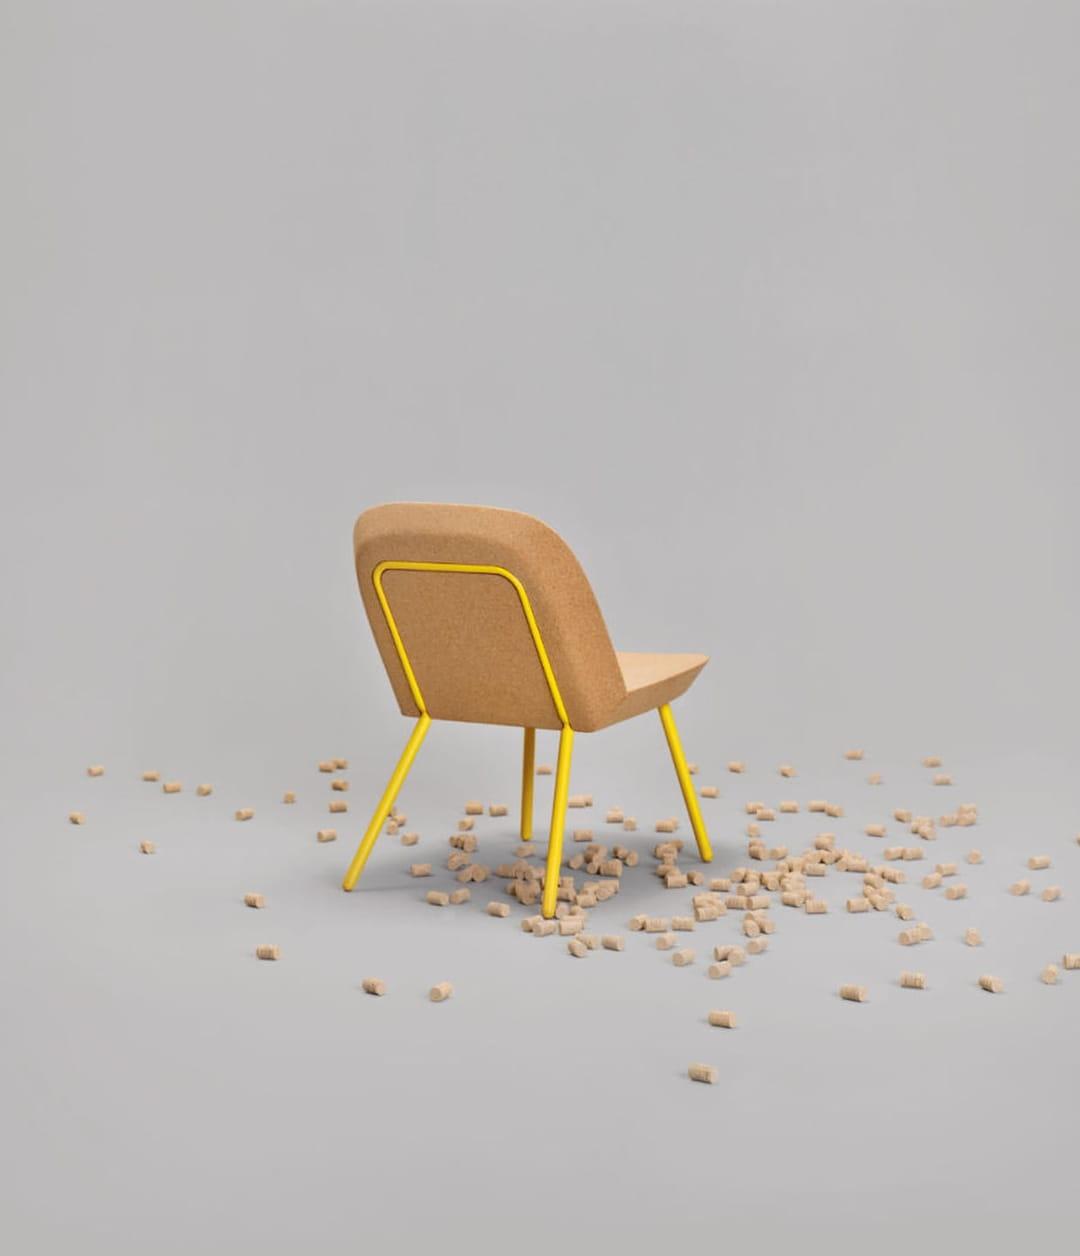 rodet-fauteuil-liege